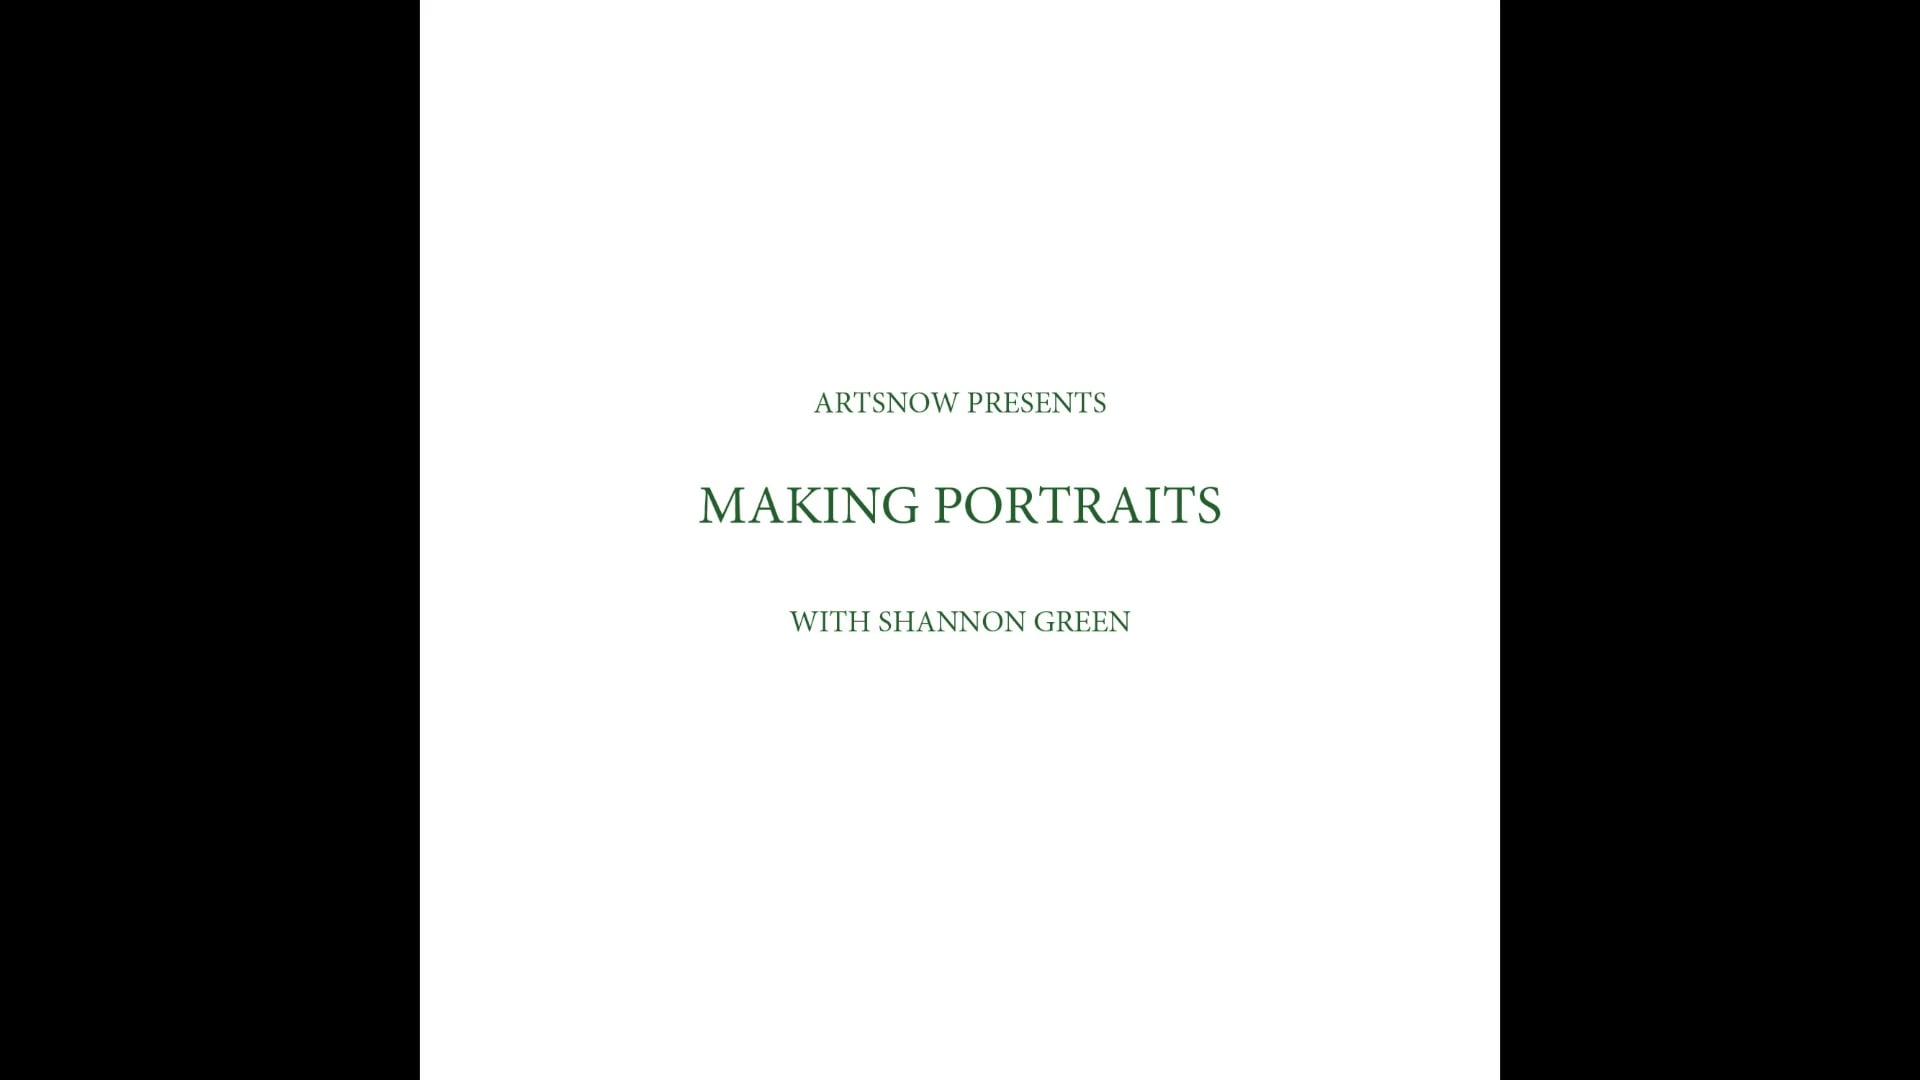 New Digital Ideas: Making Portraits